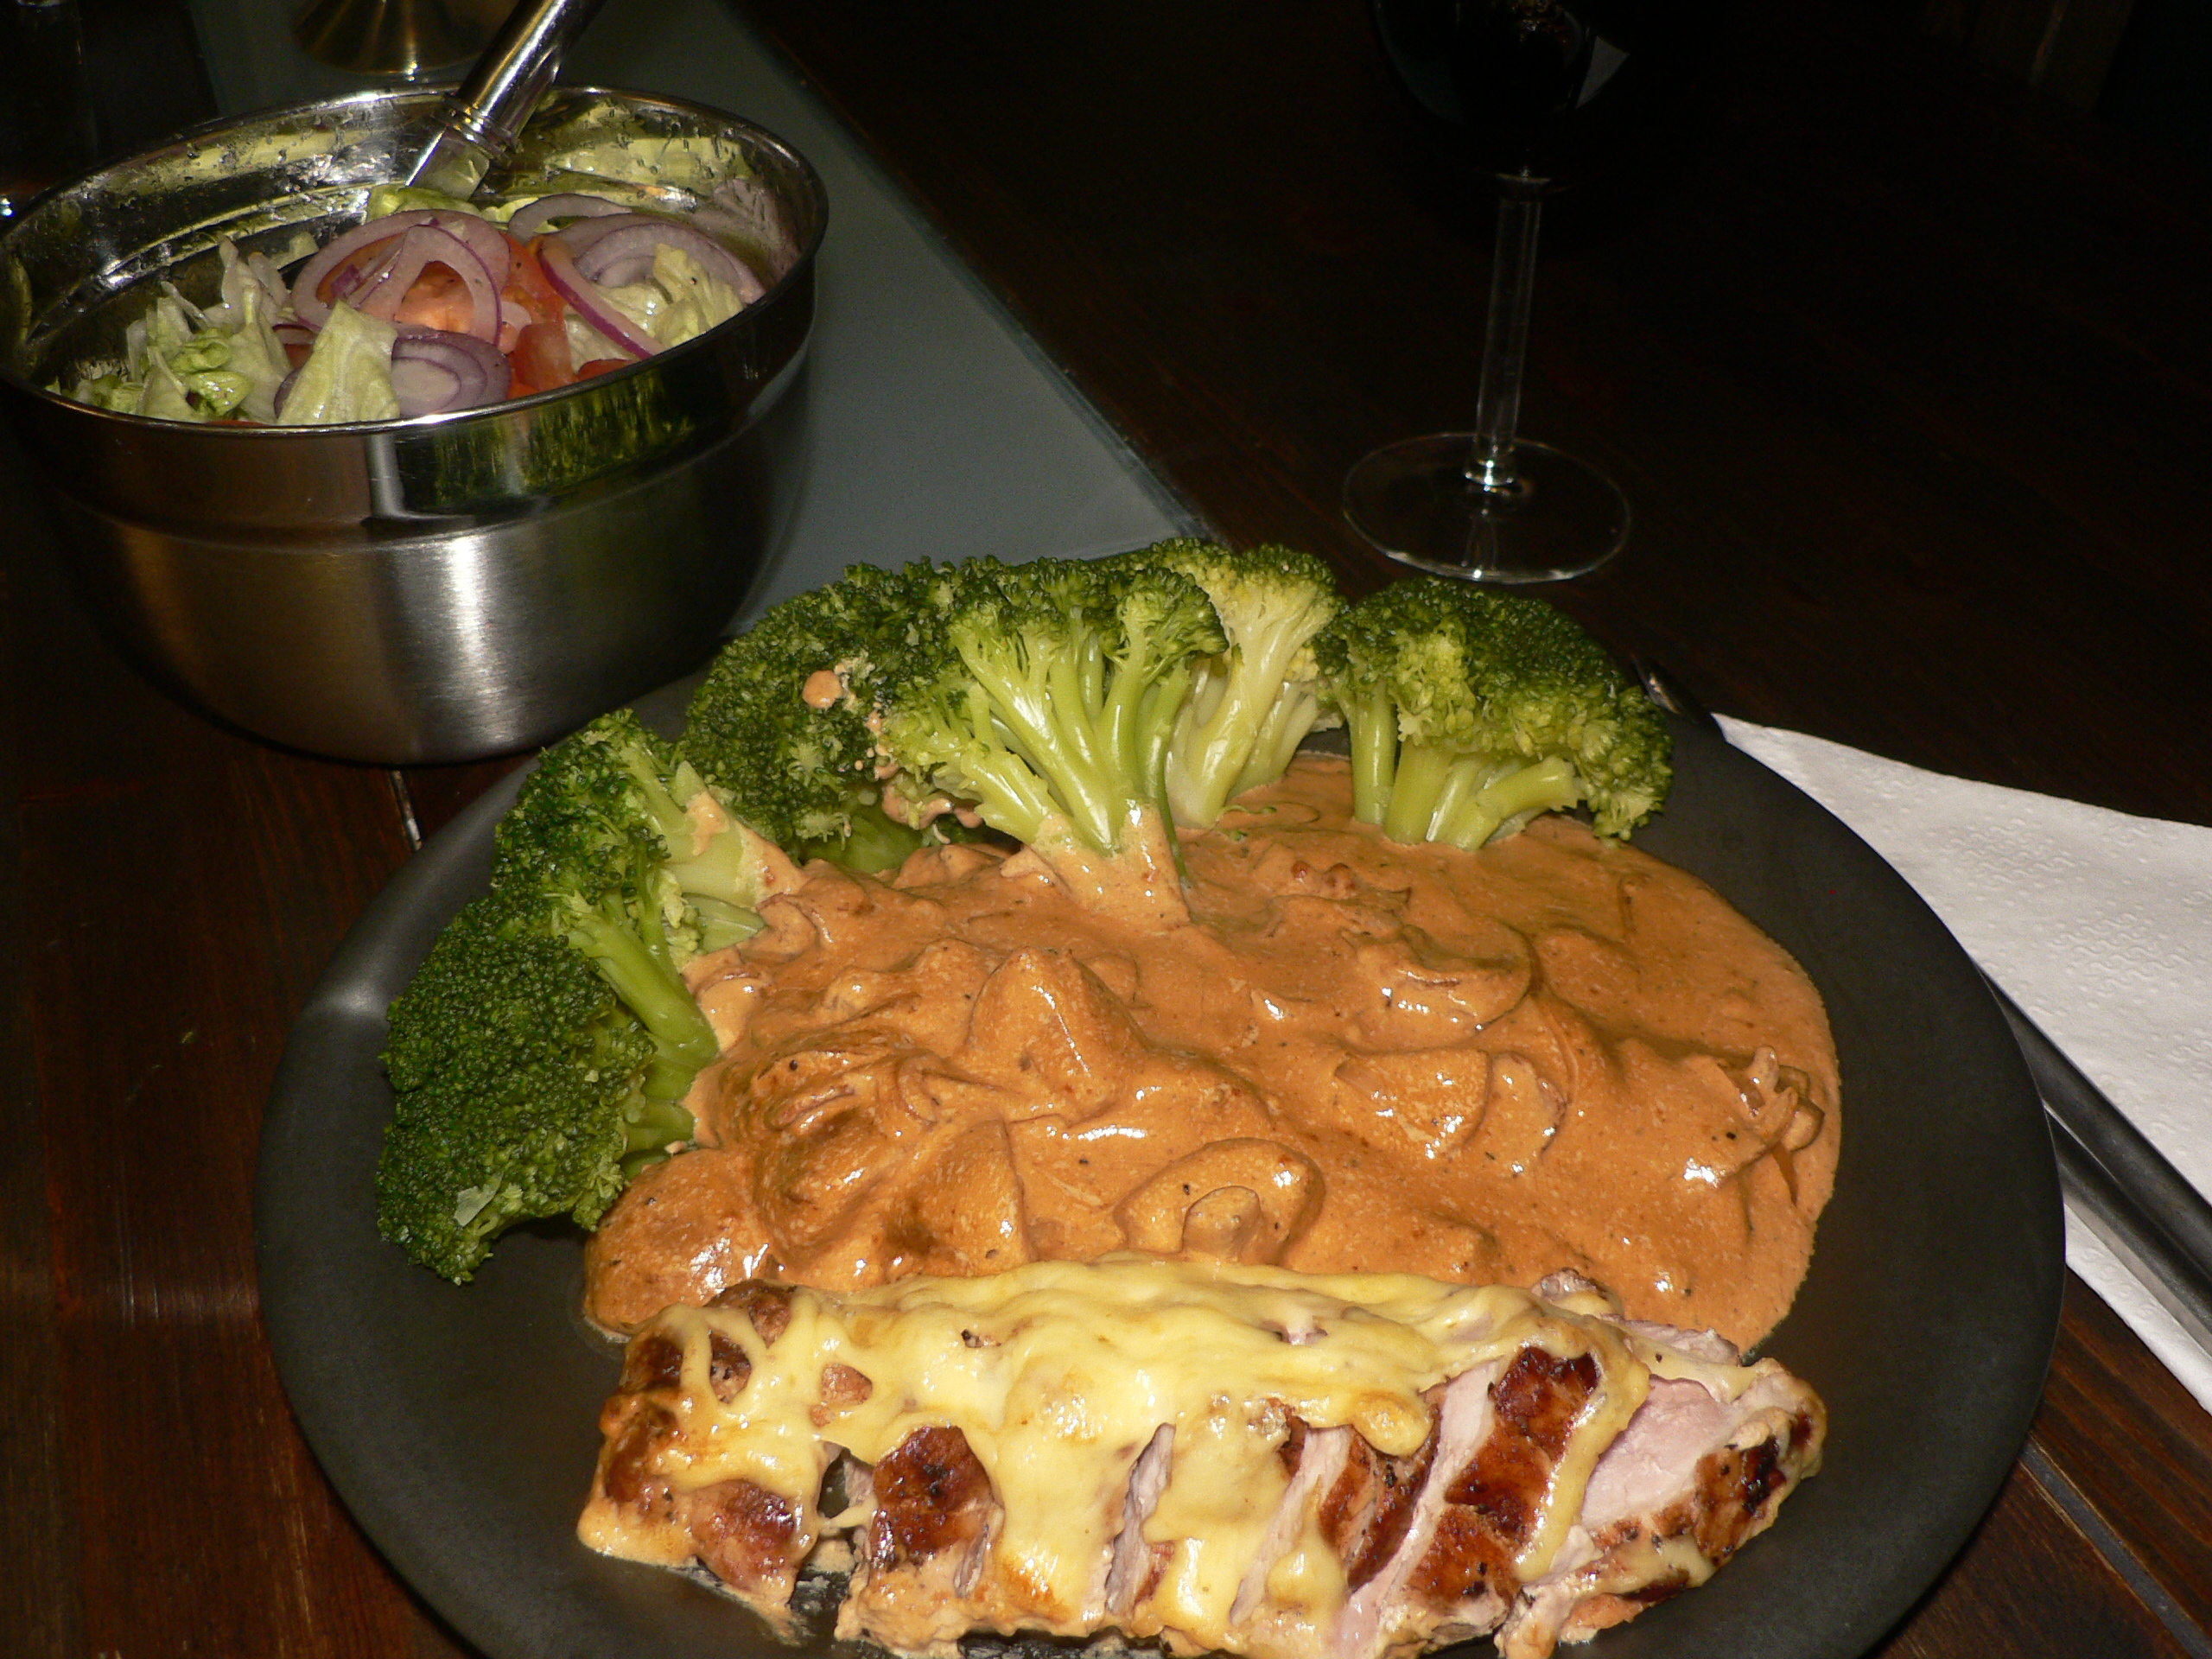 fläskfilé bacon gryta med broccoli